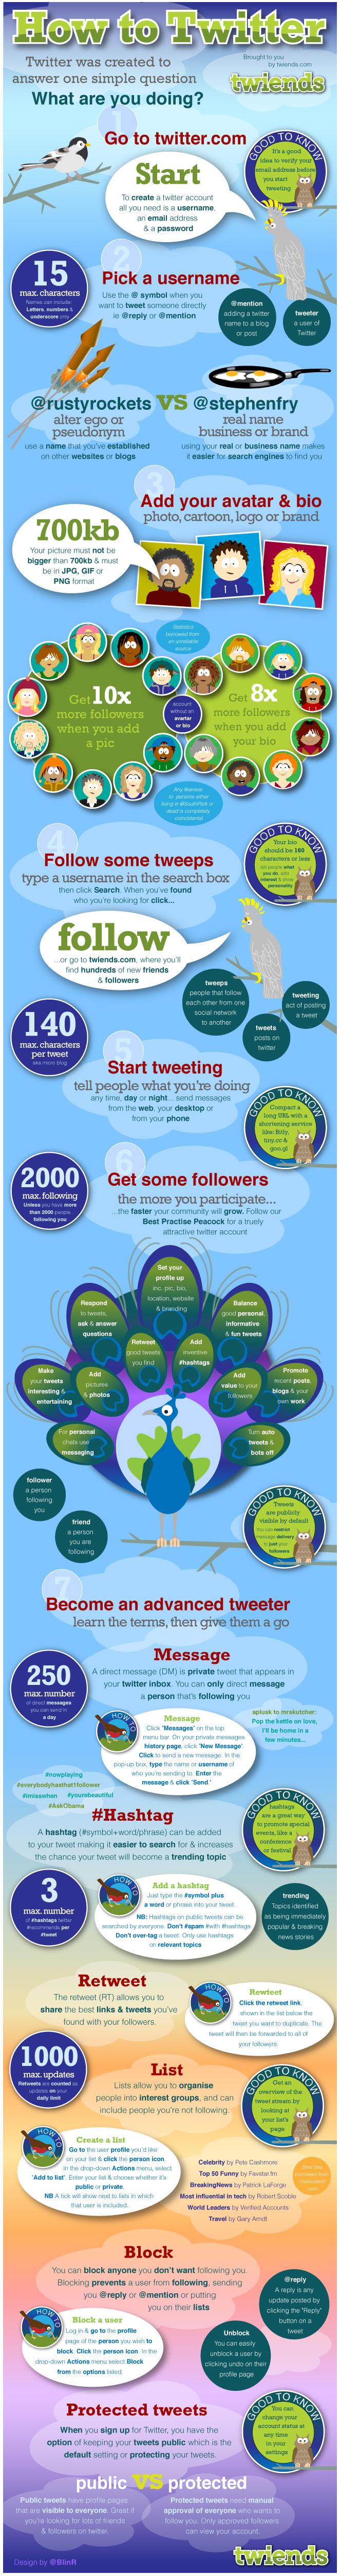 Twitter Marketing Infographic